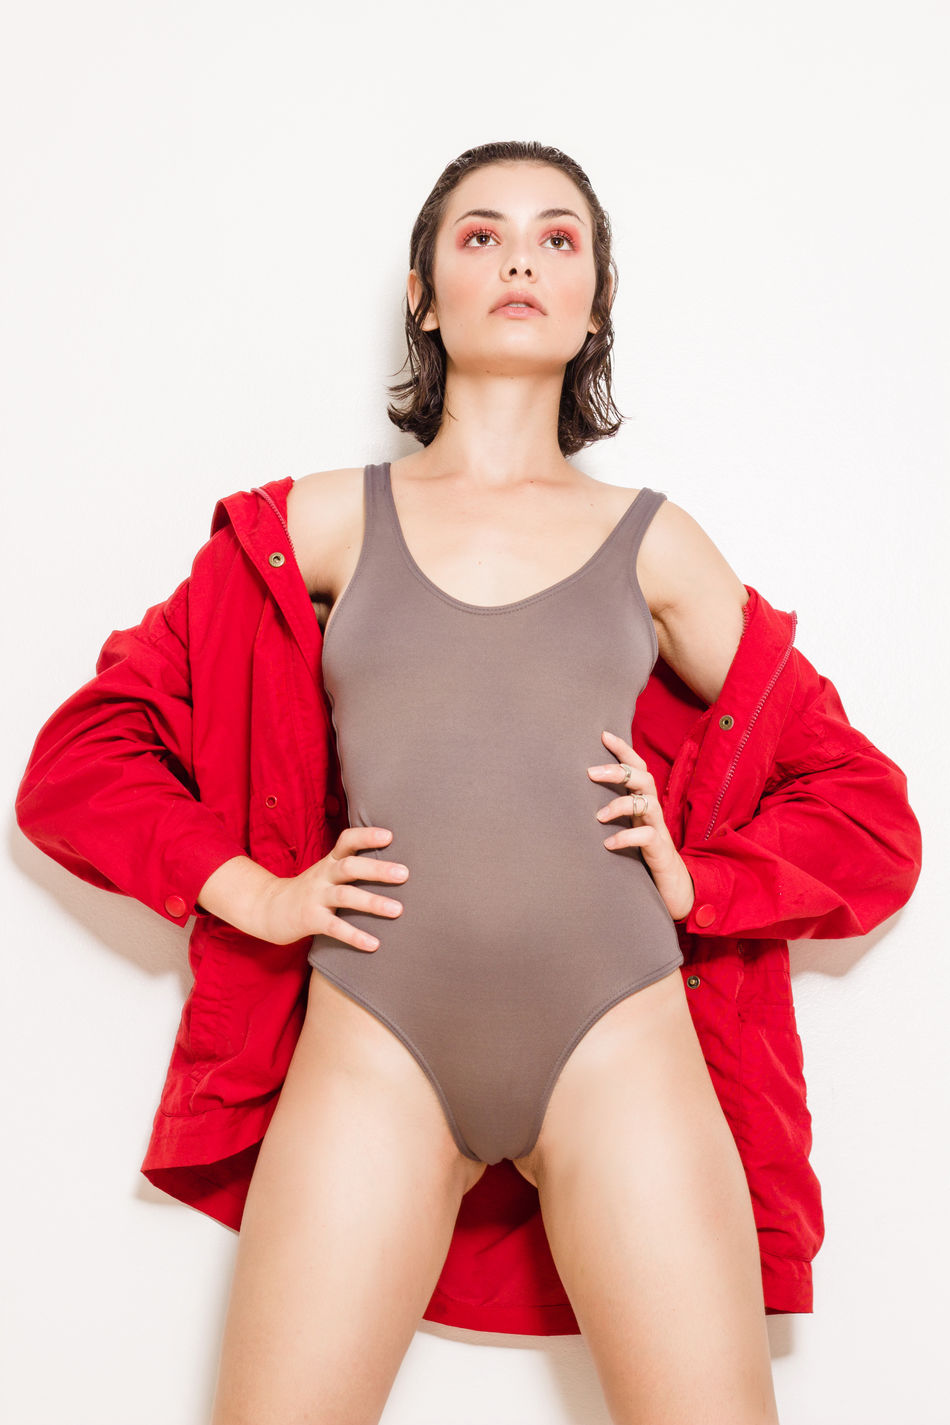 Beauty Bodysuit Coat Confidence  Fashion Portrait Studio Shot White Background Women